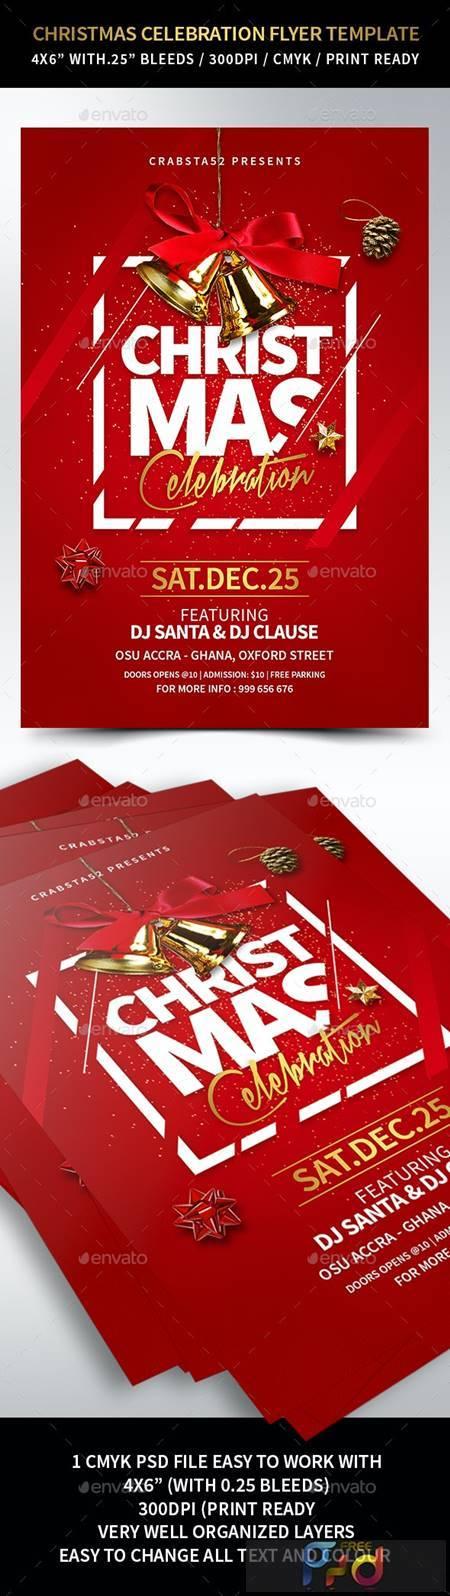 Christmas Celebration Flyer Template 22931714 1